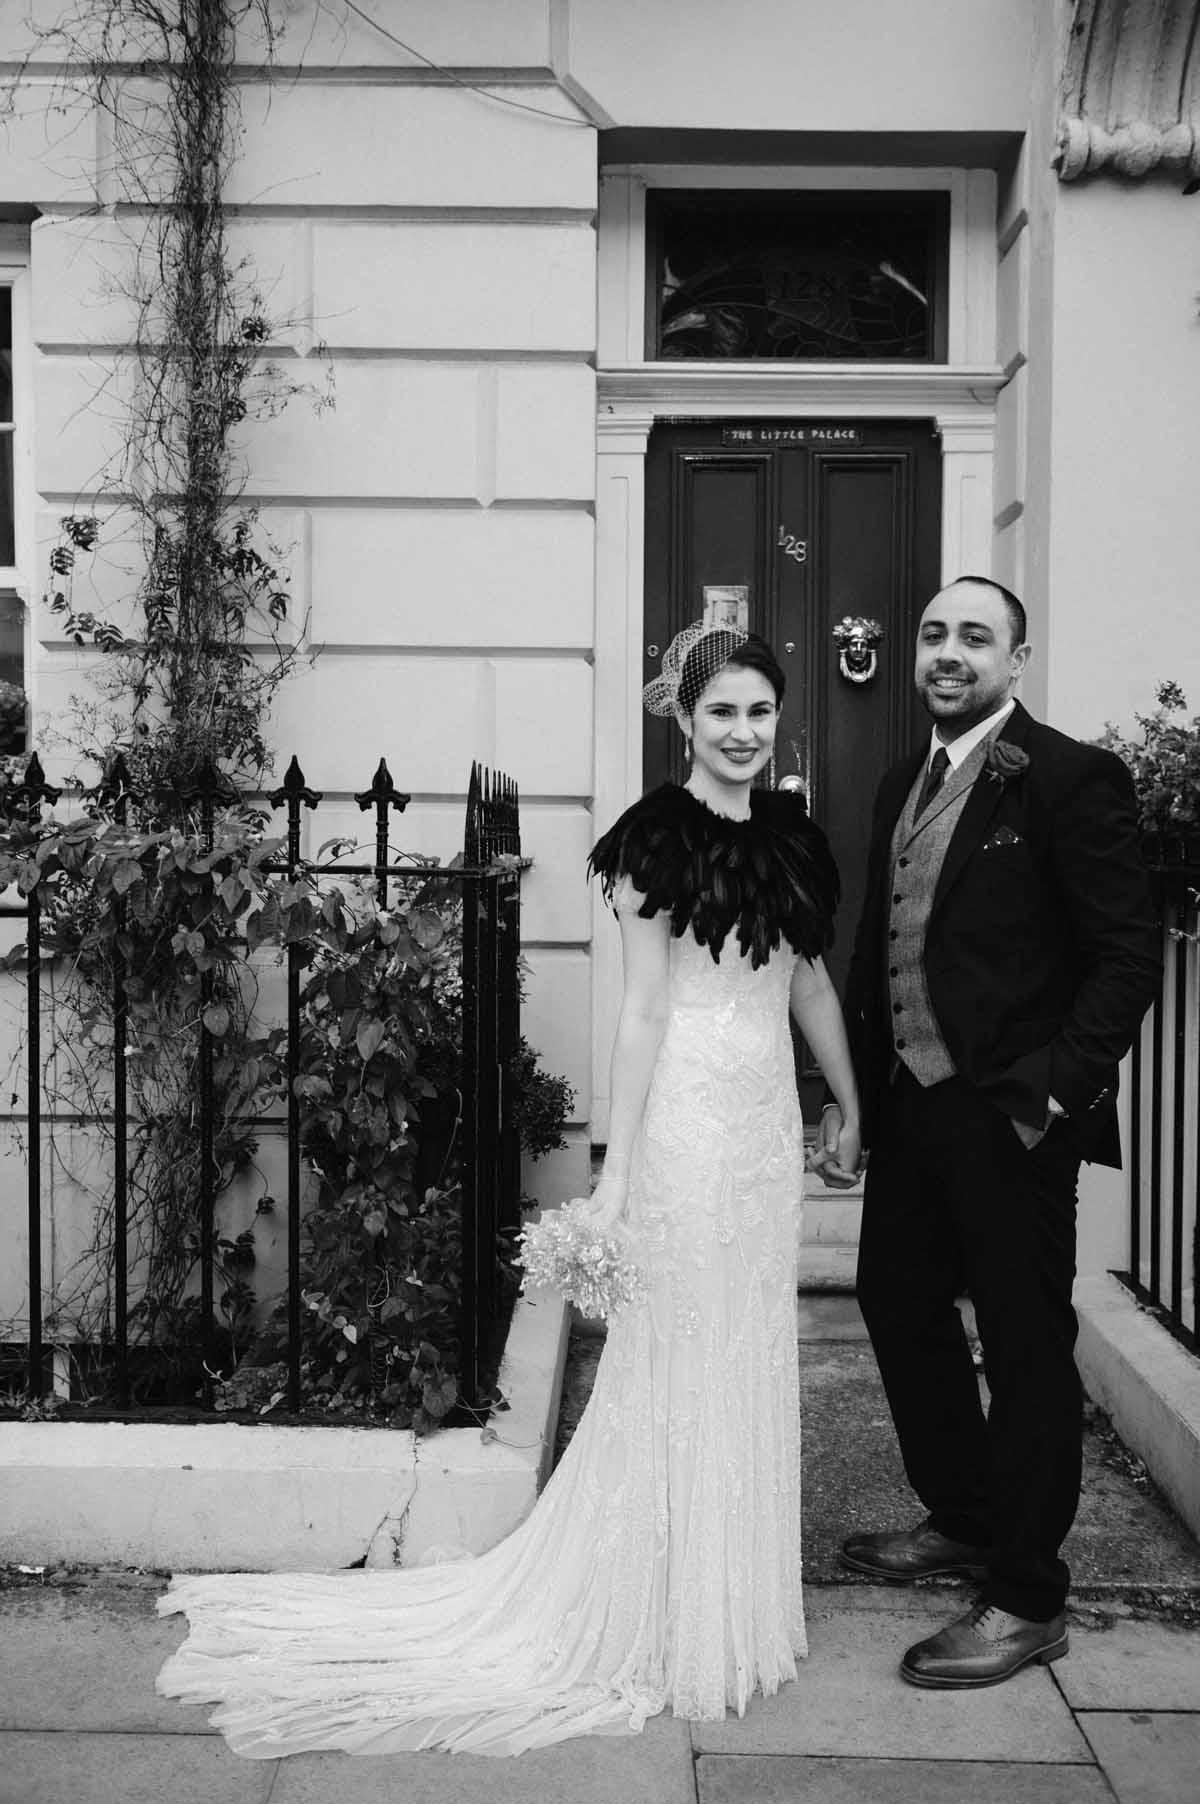 urban-wedding-image